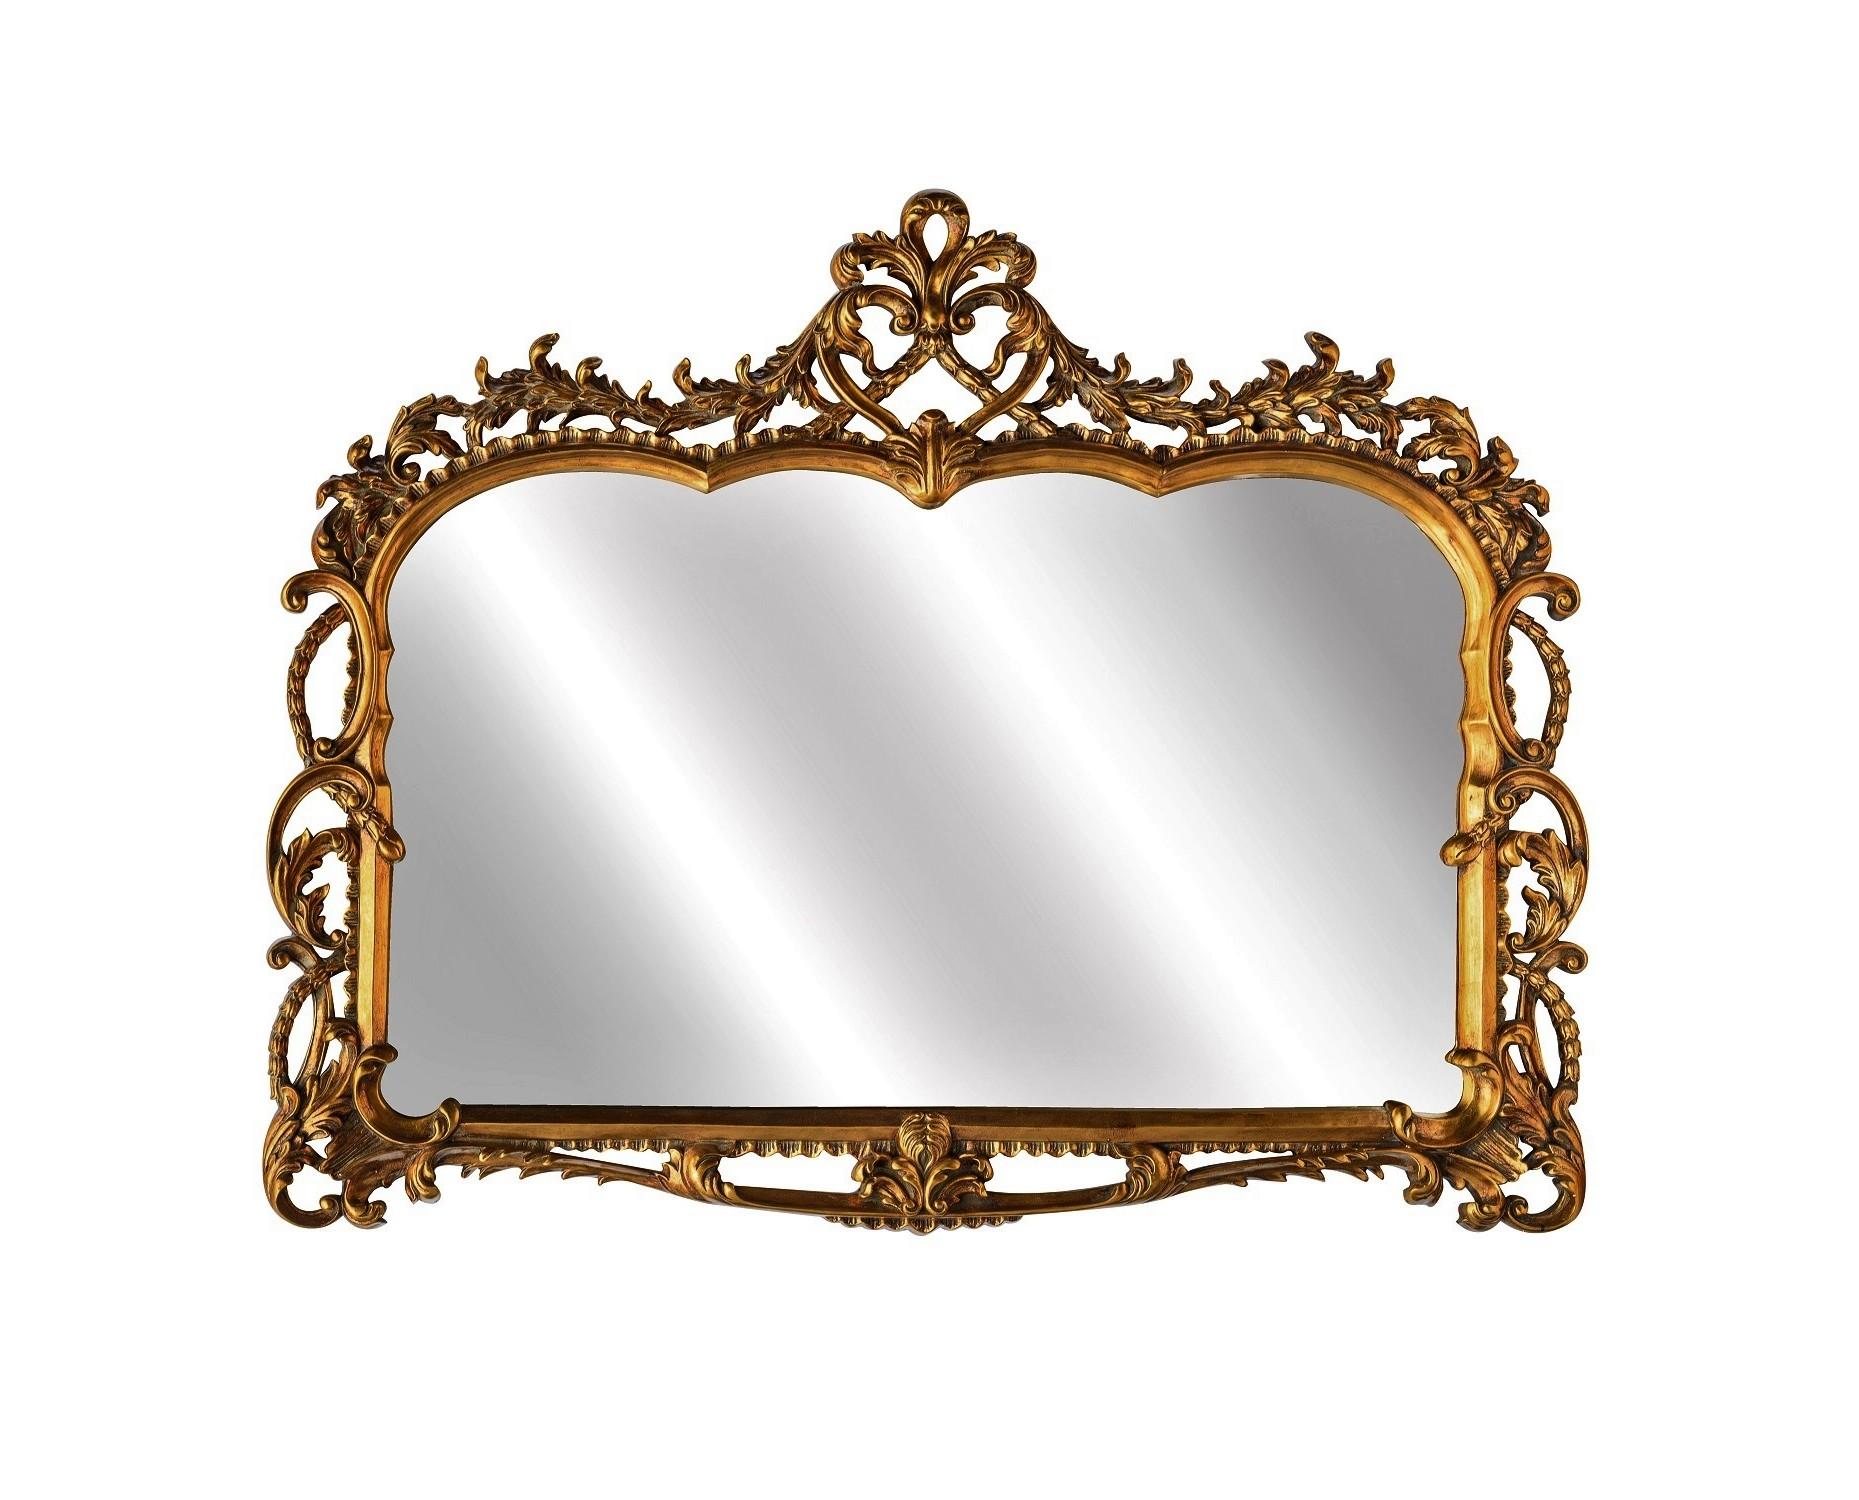 Зеркало EloiseНастенные зеркала<br><br><br>Material: Стекло<br>Length см: 140.0<br>Width см: 110.0<br>Depth см: 6.0<br>Height см: None<br>Diameter см: None